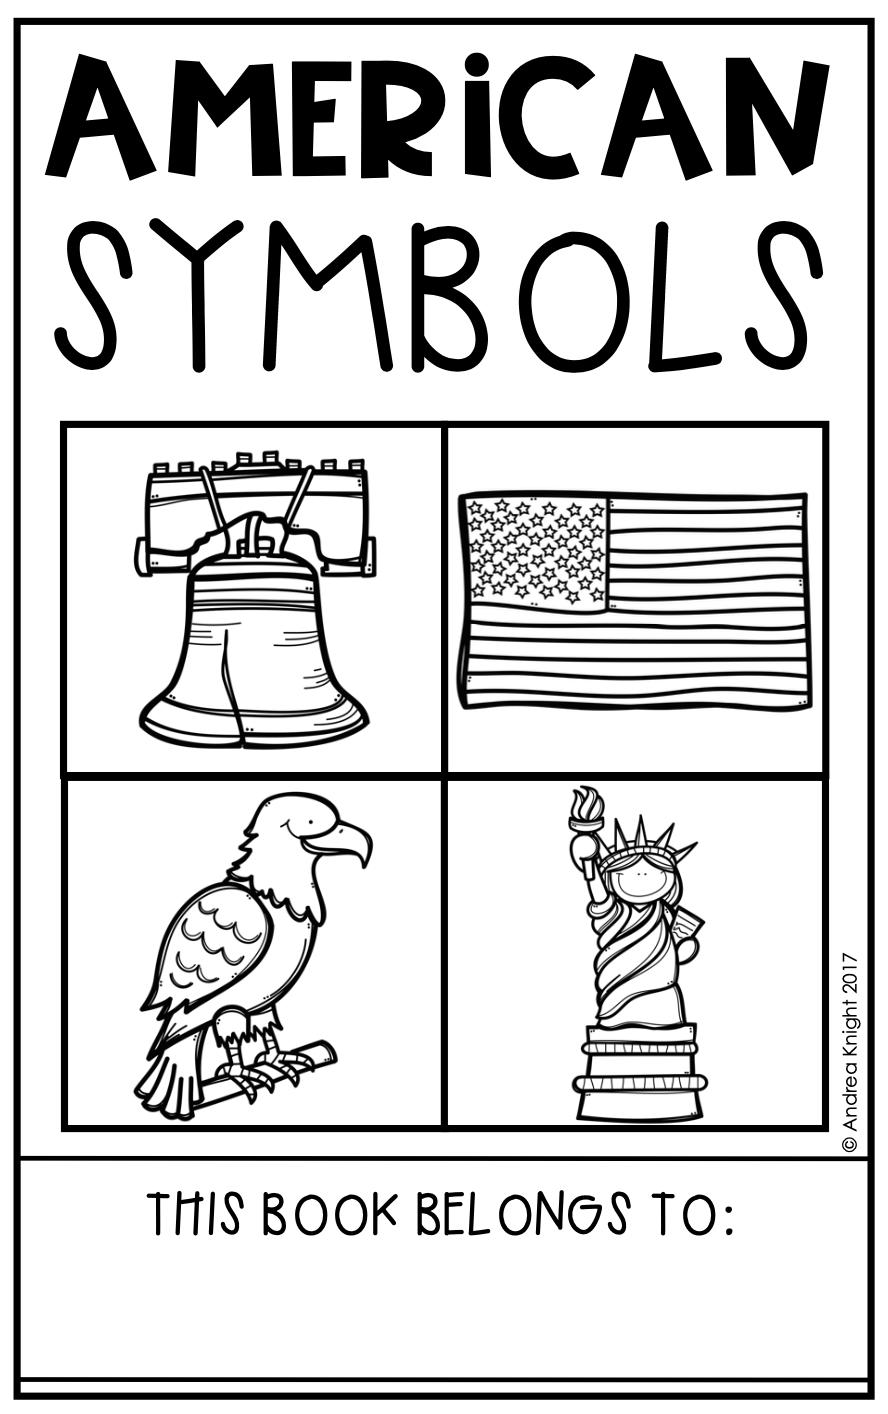 medium resolution of American Symbols Book for Children   American symbols book